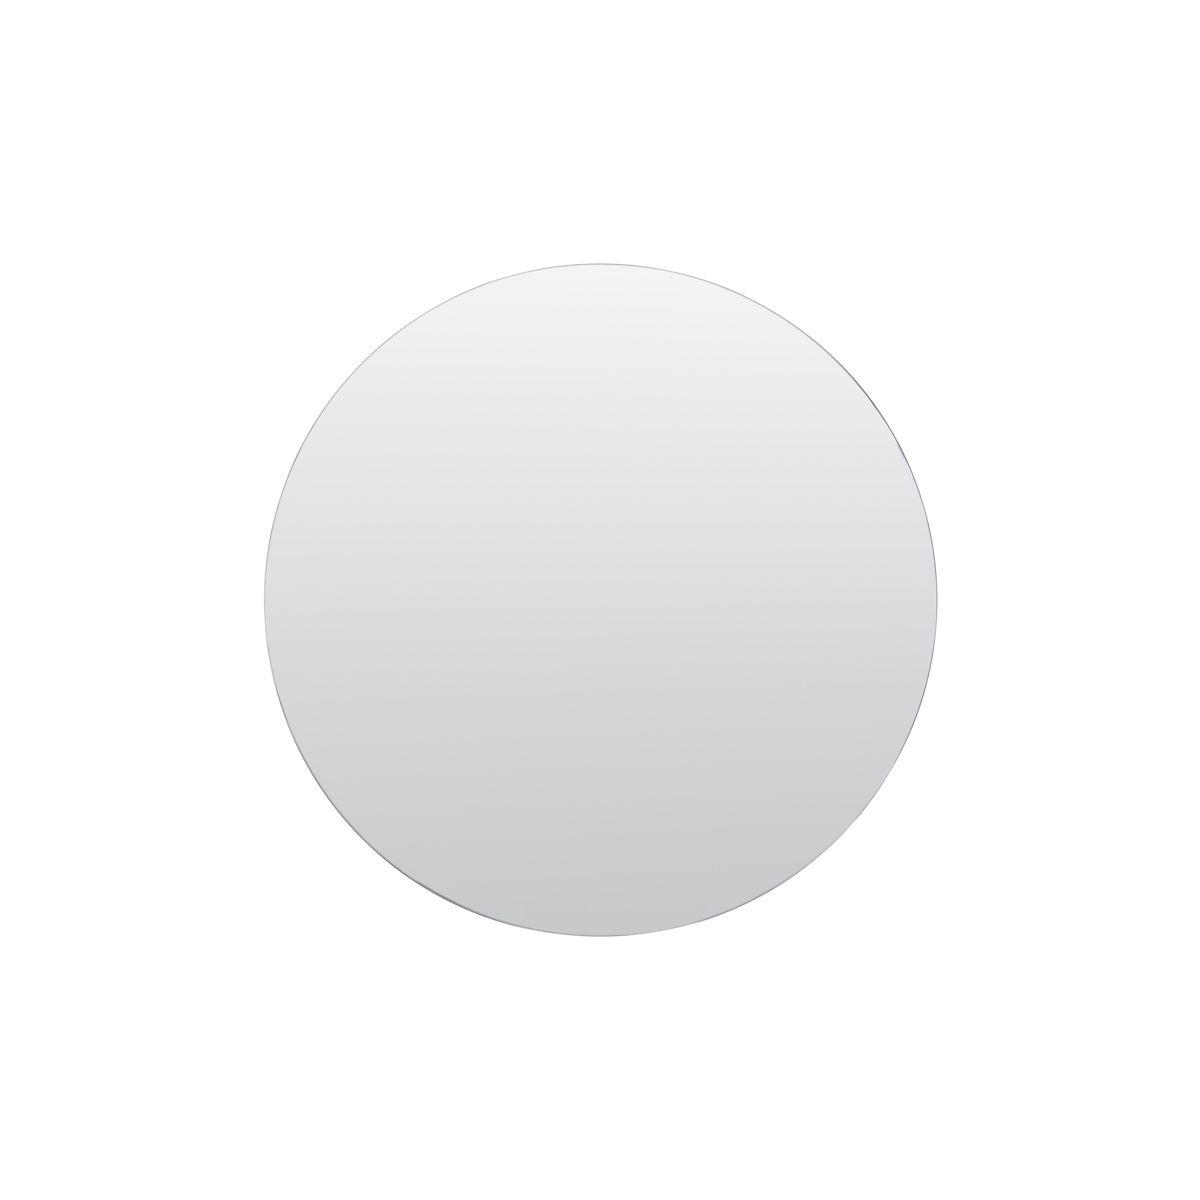 Spegel Ø80cm klarglas WALLS MIRROR, House Doctor